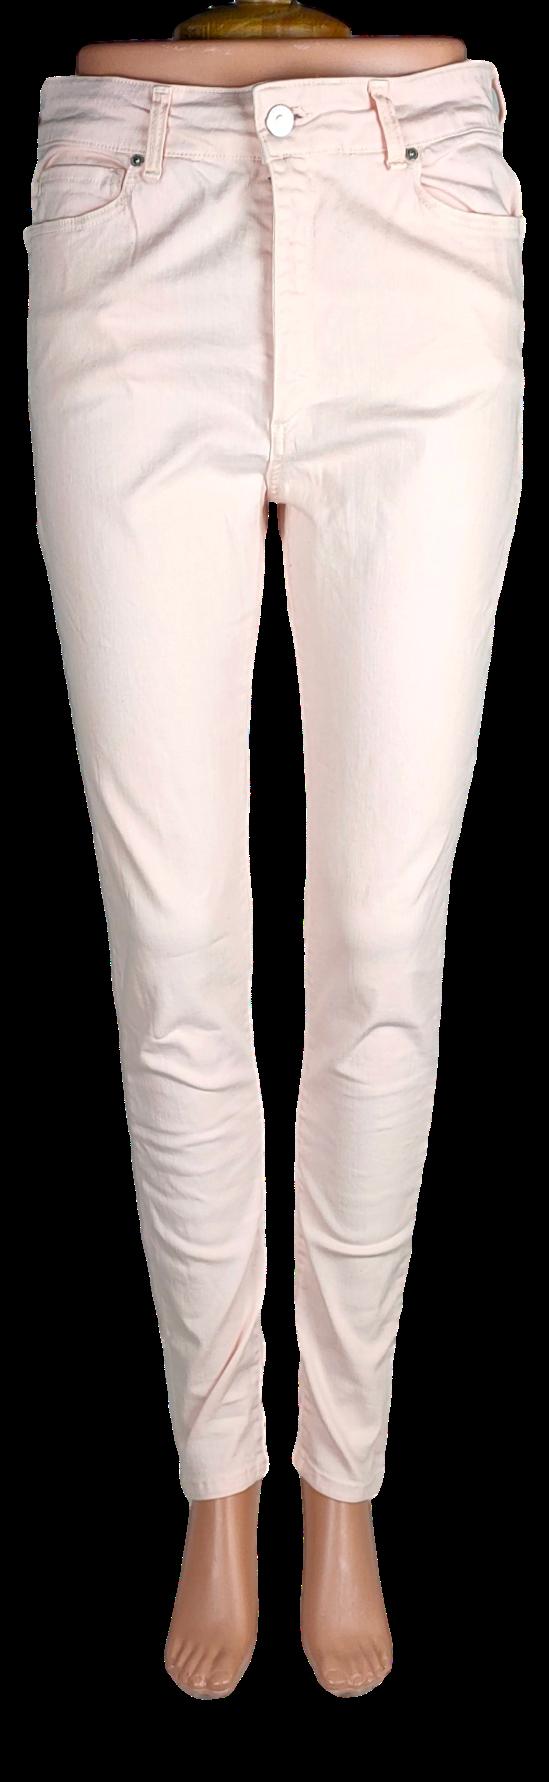 Pantalon Mango -Taille 42